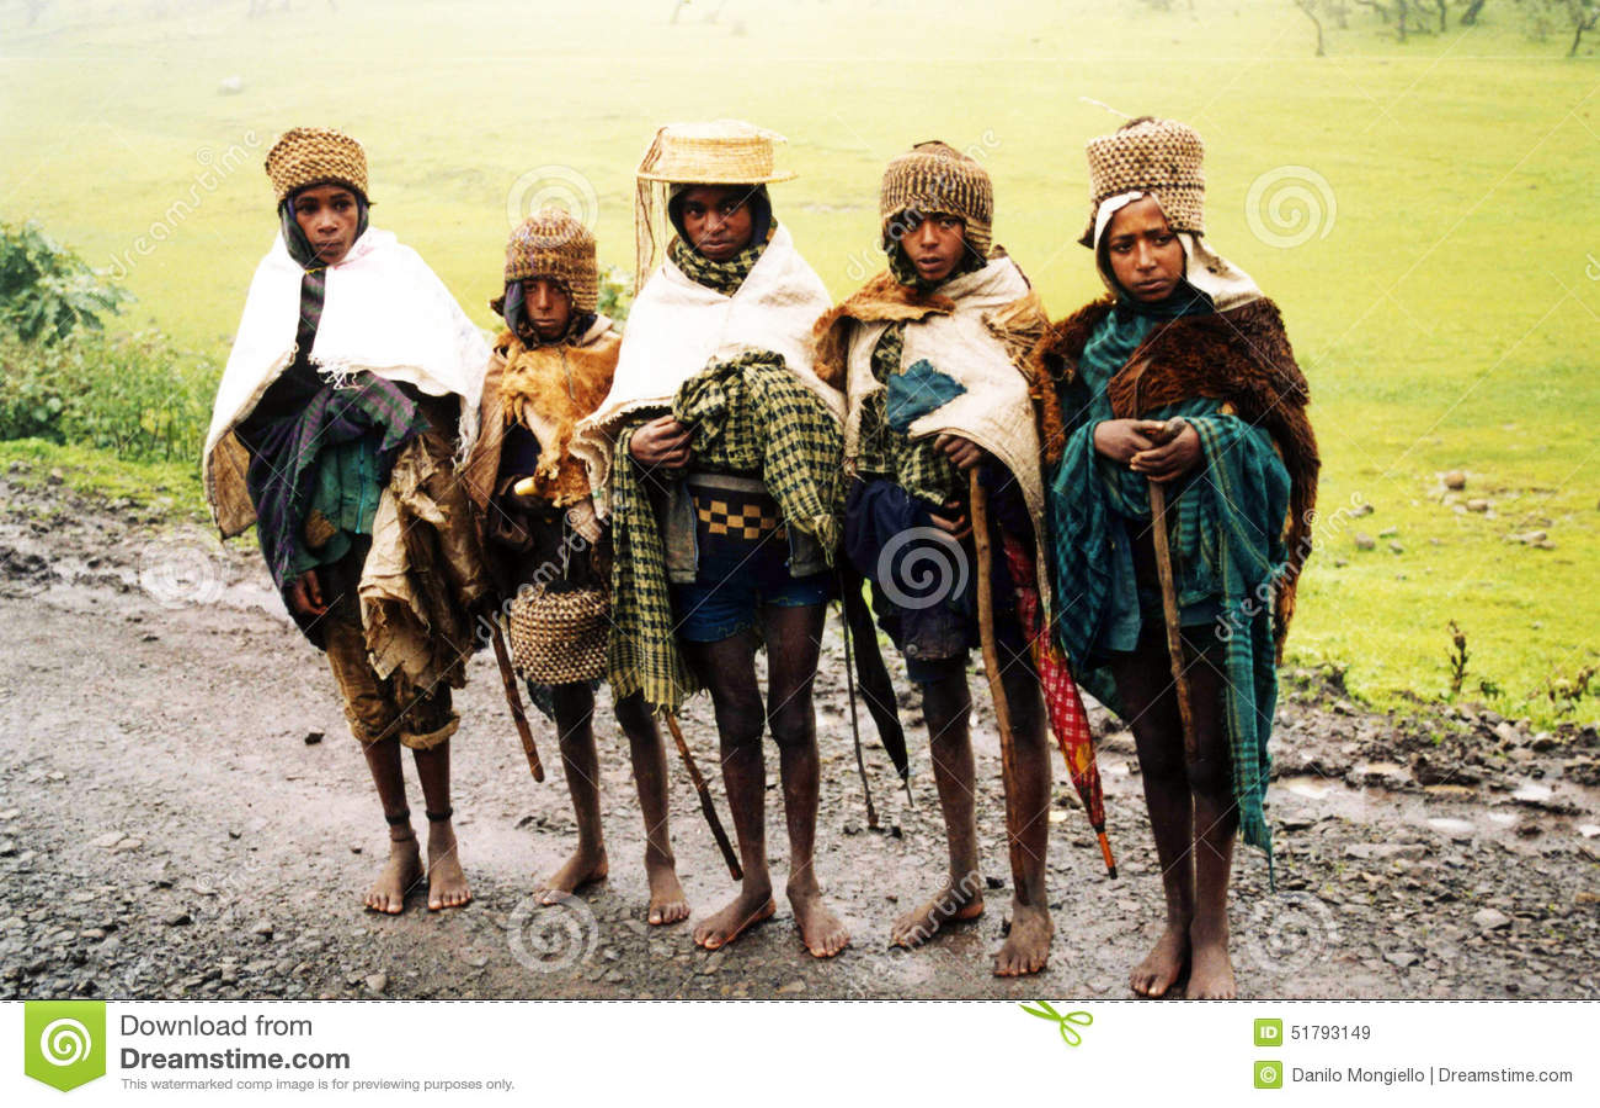 Ethiopian Mountain People Editorial Stock Image - Image ...